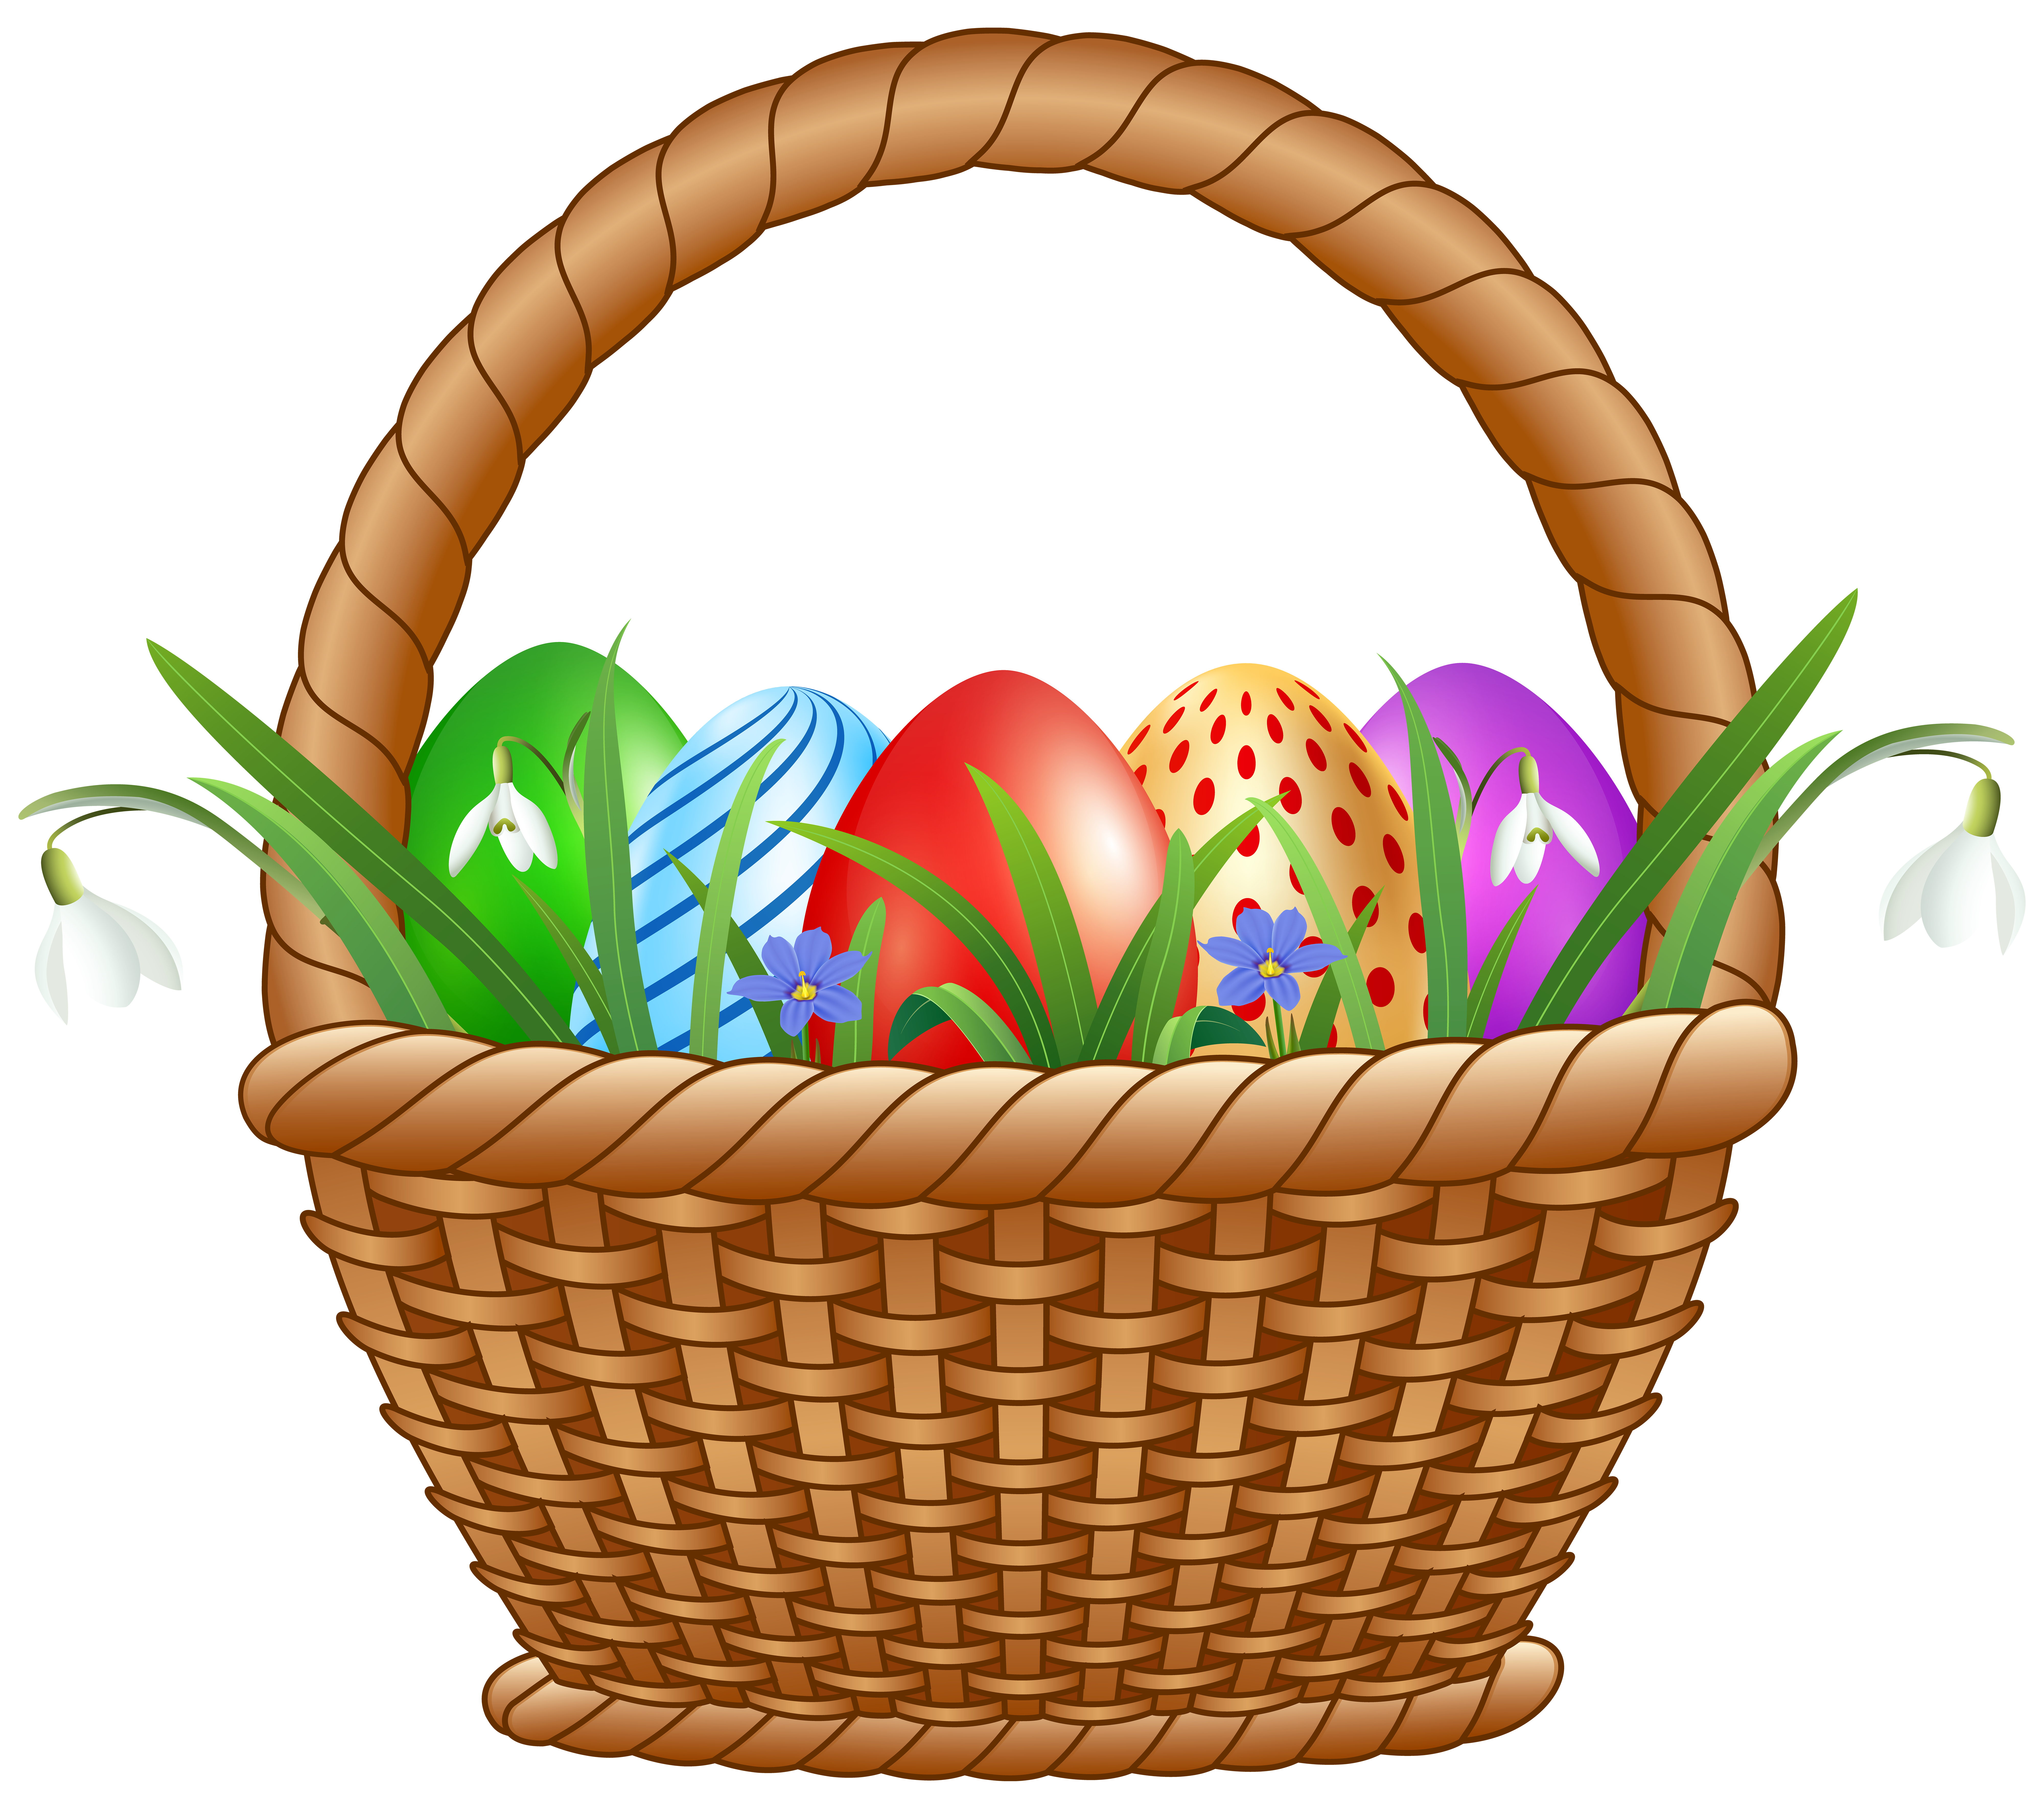 Easter Basket with Eggs Transparent Image.